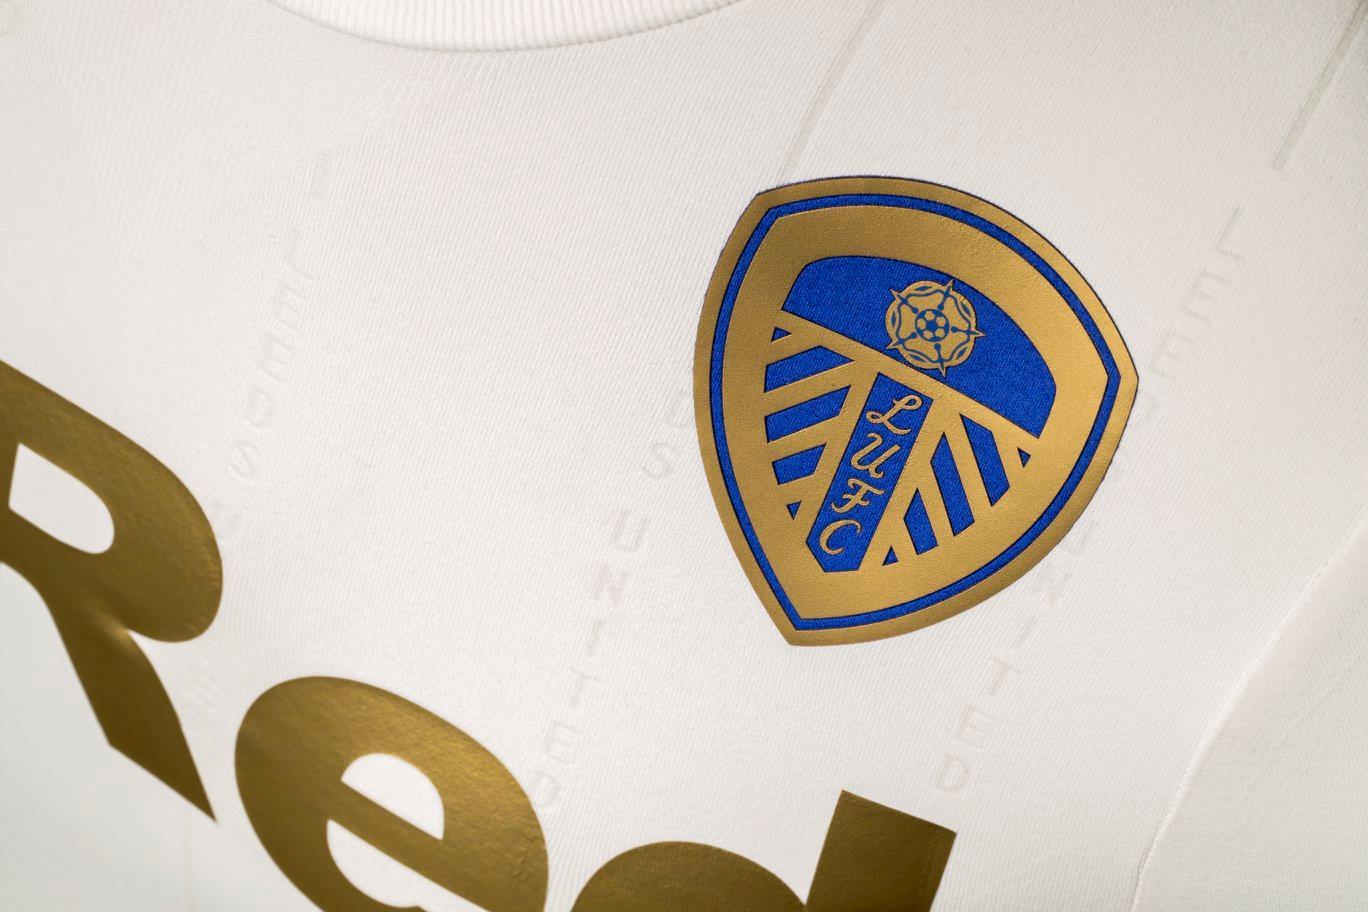 Leeds United 17-18 Home & Away Kits Released - Footy Headlines